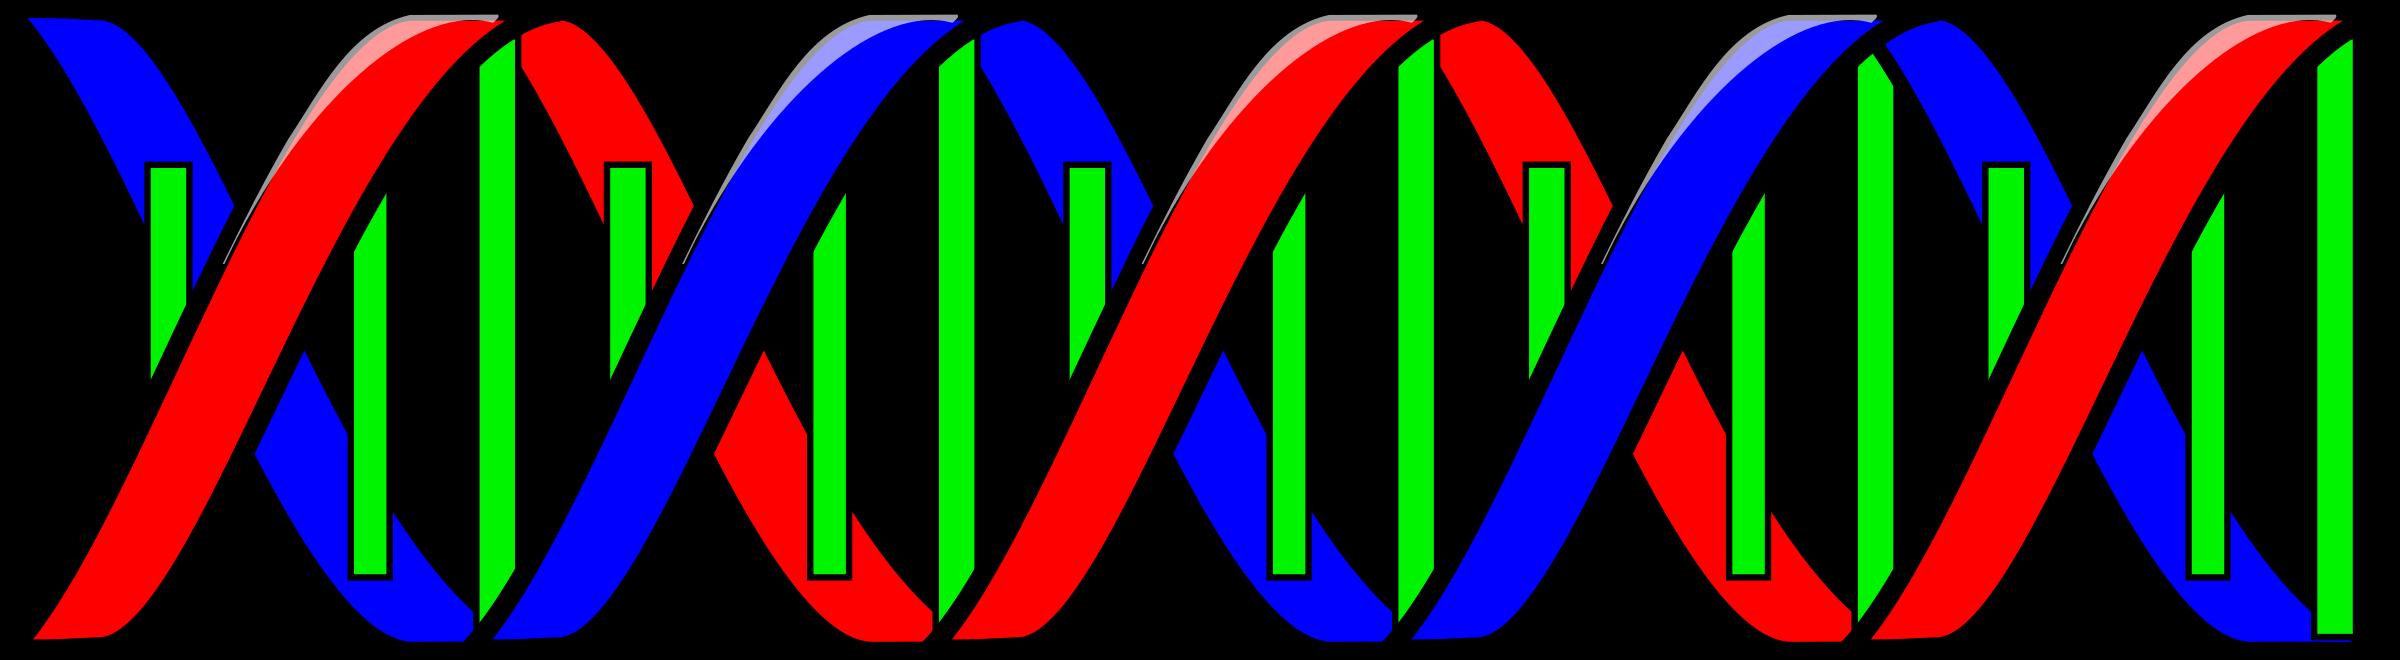 DNA Structure clipart Clipart art Clipart Clip DNA